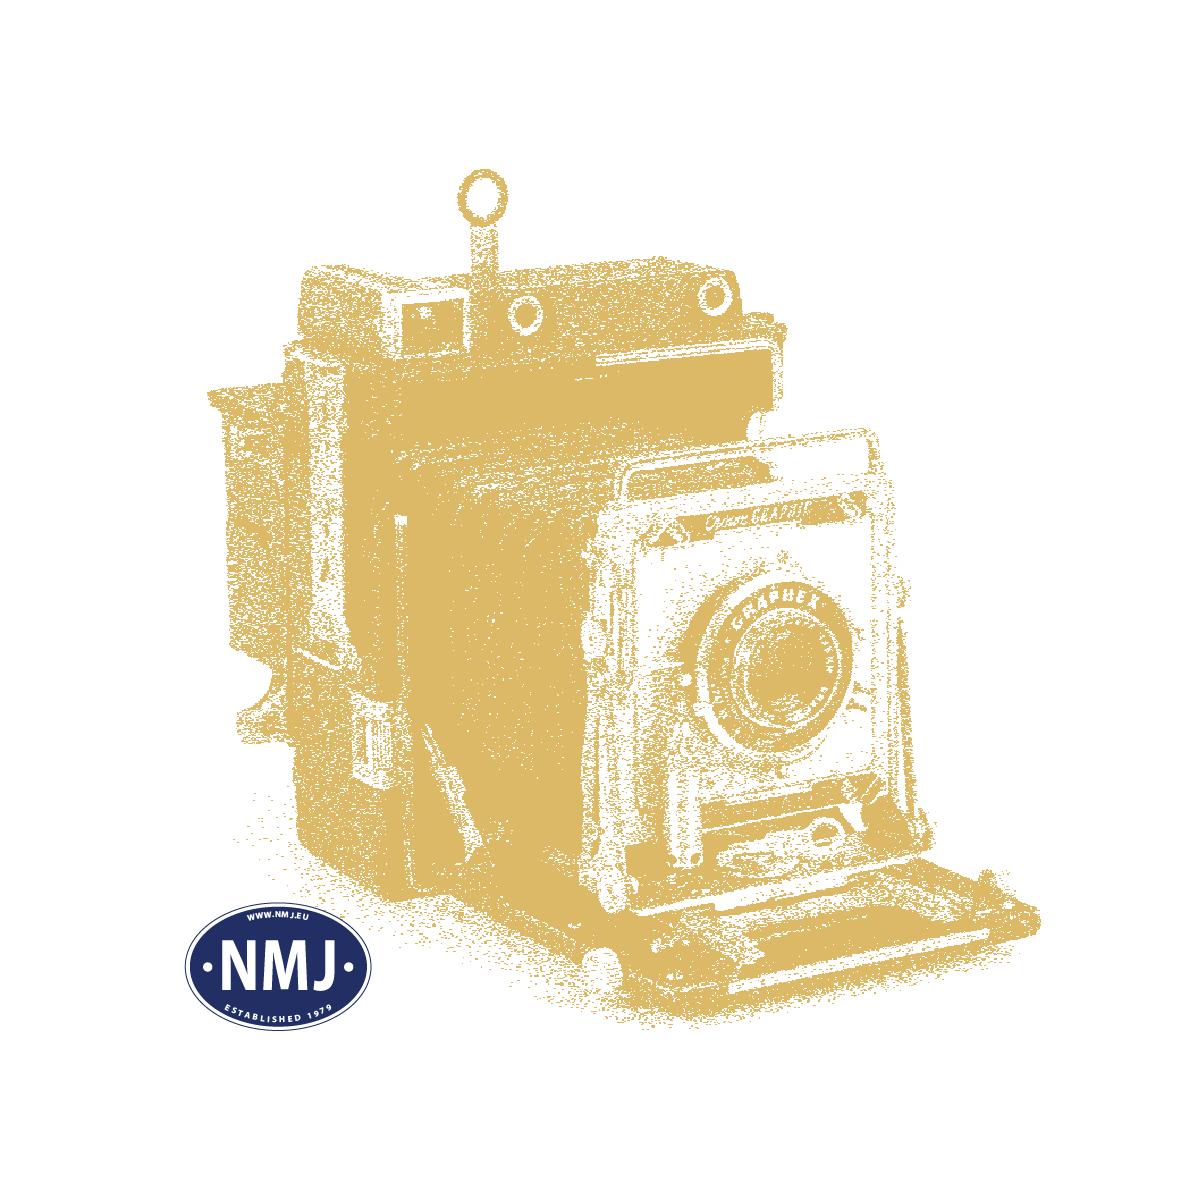 NMJT506.303 - NMJ Topline NSB Gbs 150 0 111-2